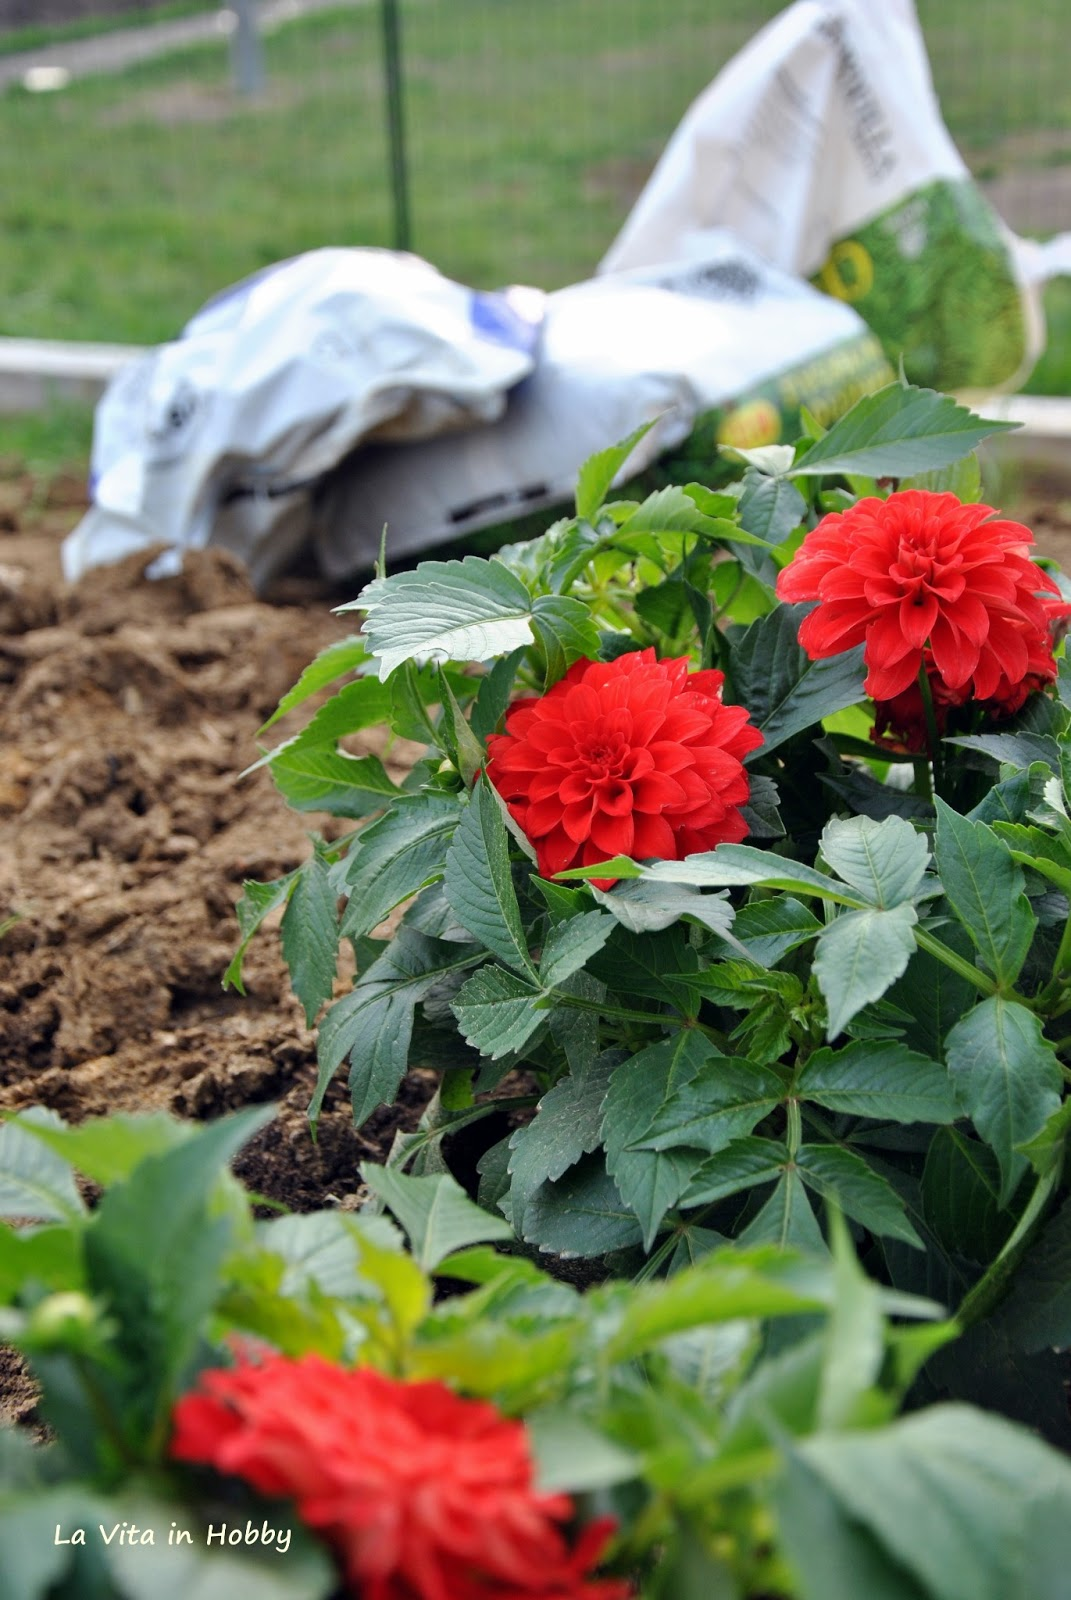 La vita in hobby aprile 2013 - Sacchi di terra per giardino ...